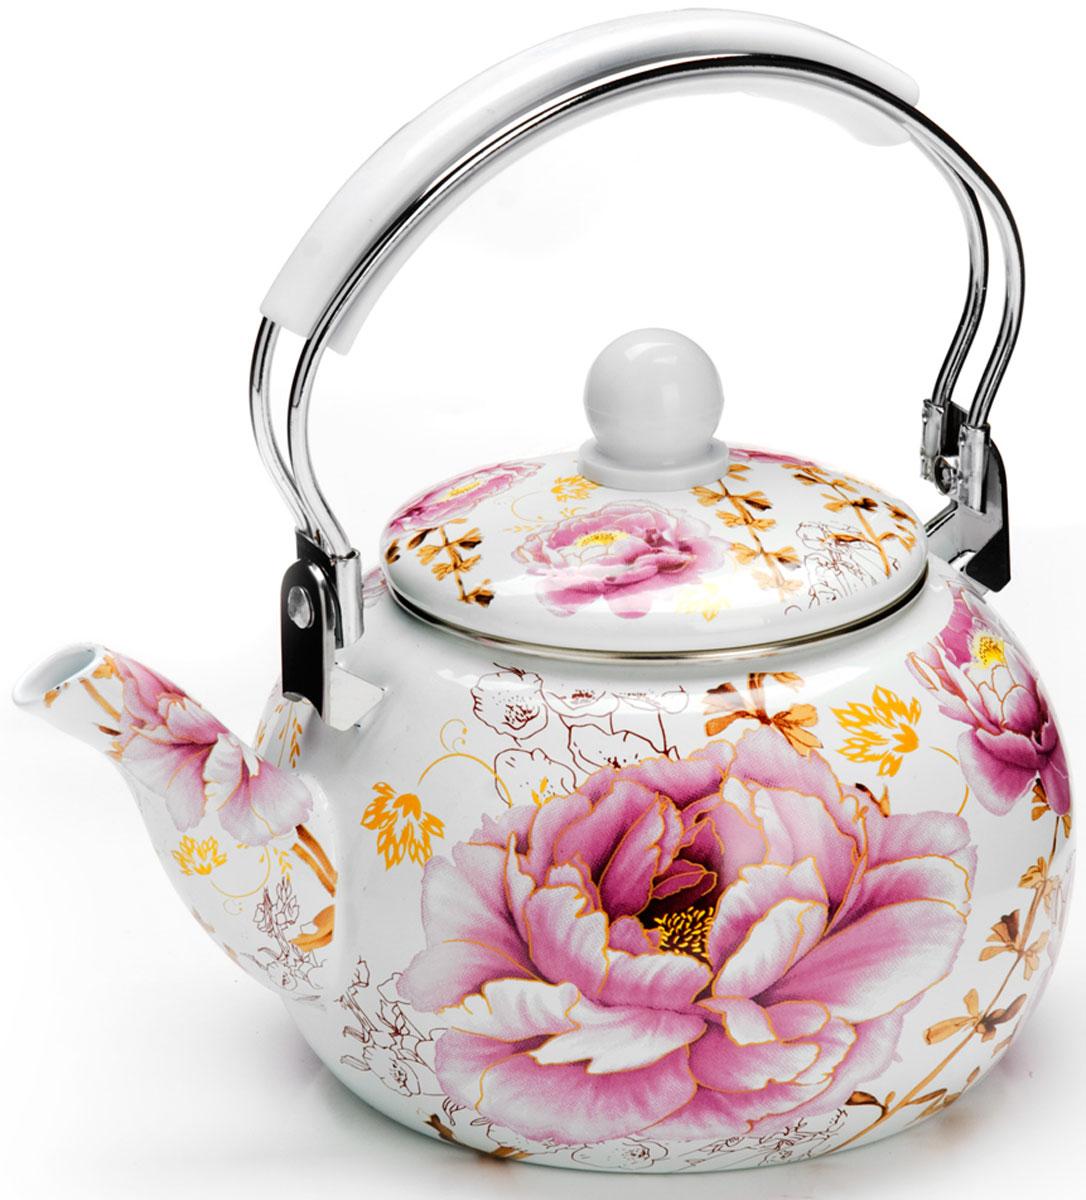 Чайник Mayer & Boch Цветы, 2,5 л. 2649026490